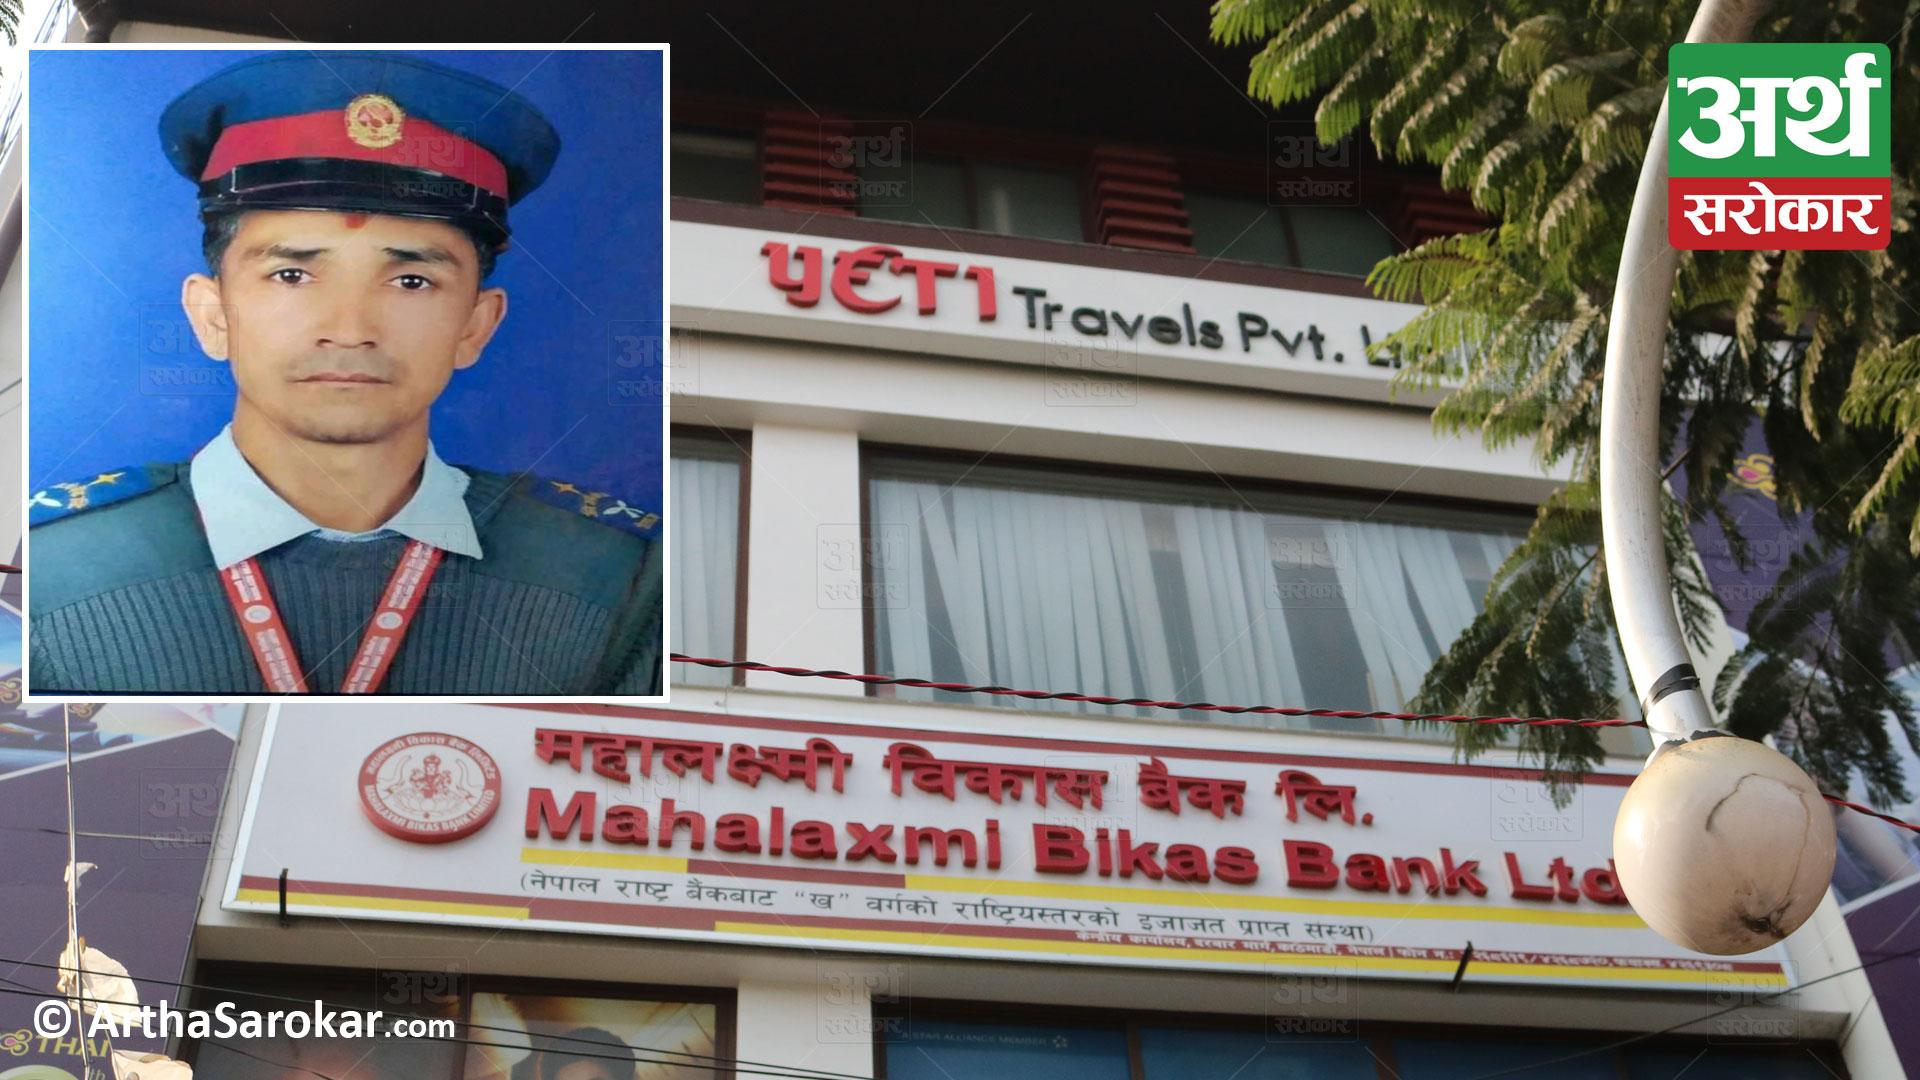 महालक्ष्मी विकास बैंकका कर्मचारीको मृत्यु